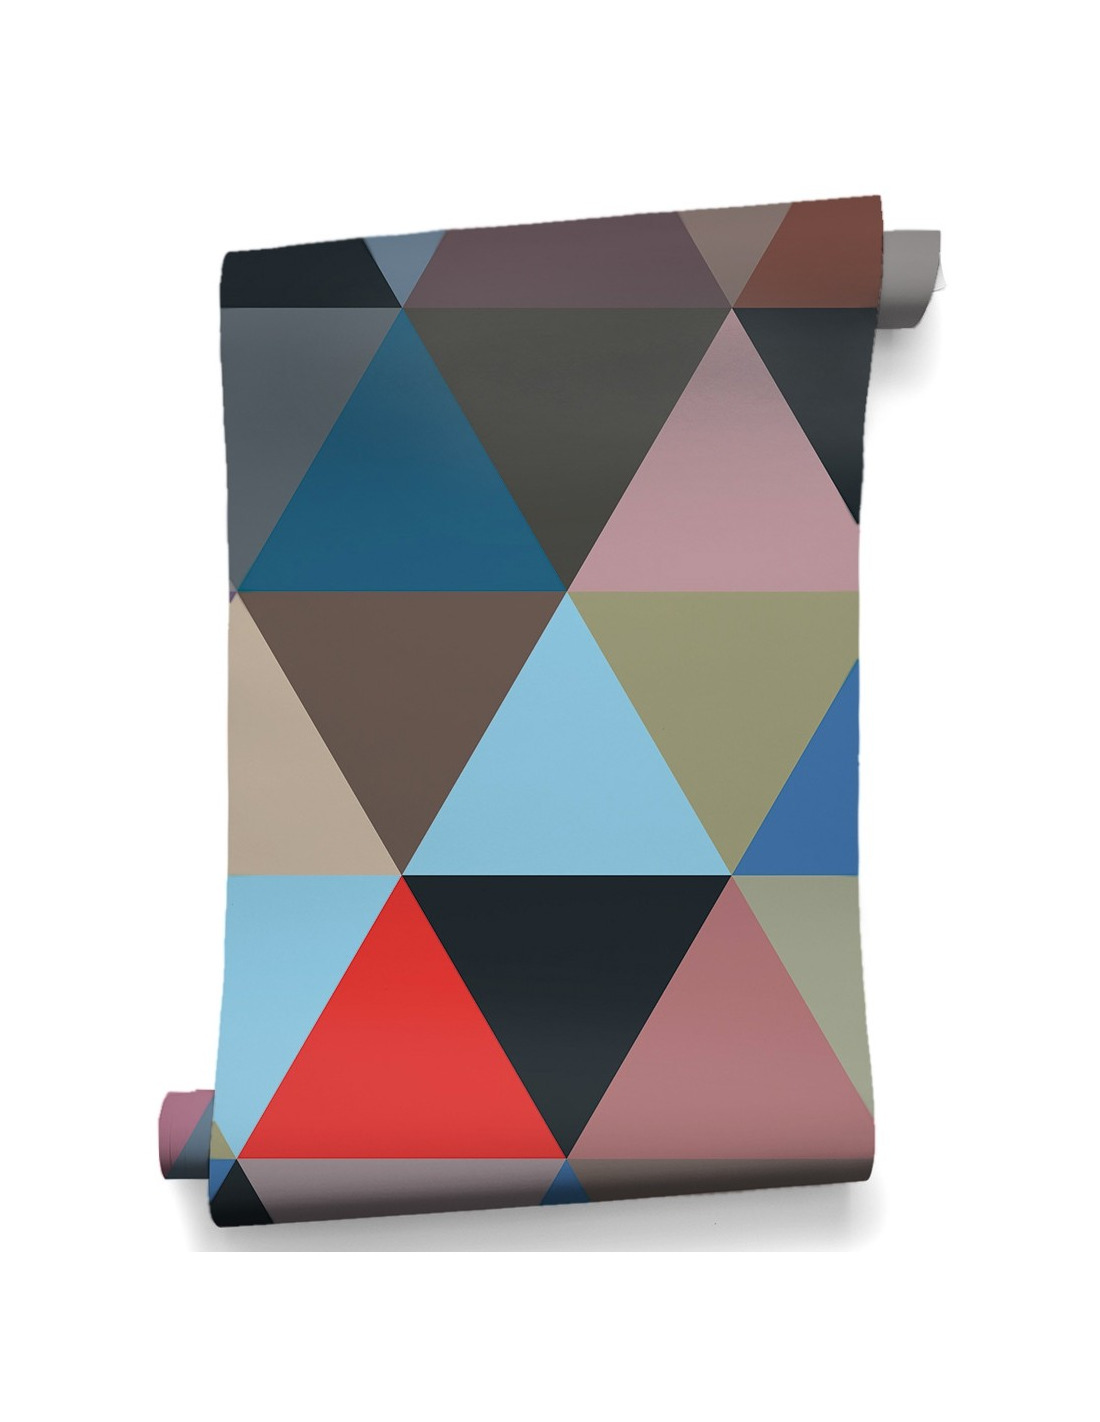 papier peint design intiss mosaic winter au design g om trique otoko. Black Bedroom Furniture Sets. Home Design Ideas